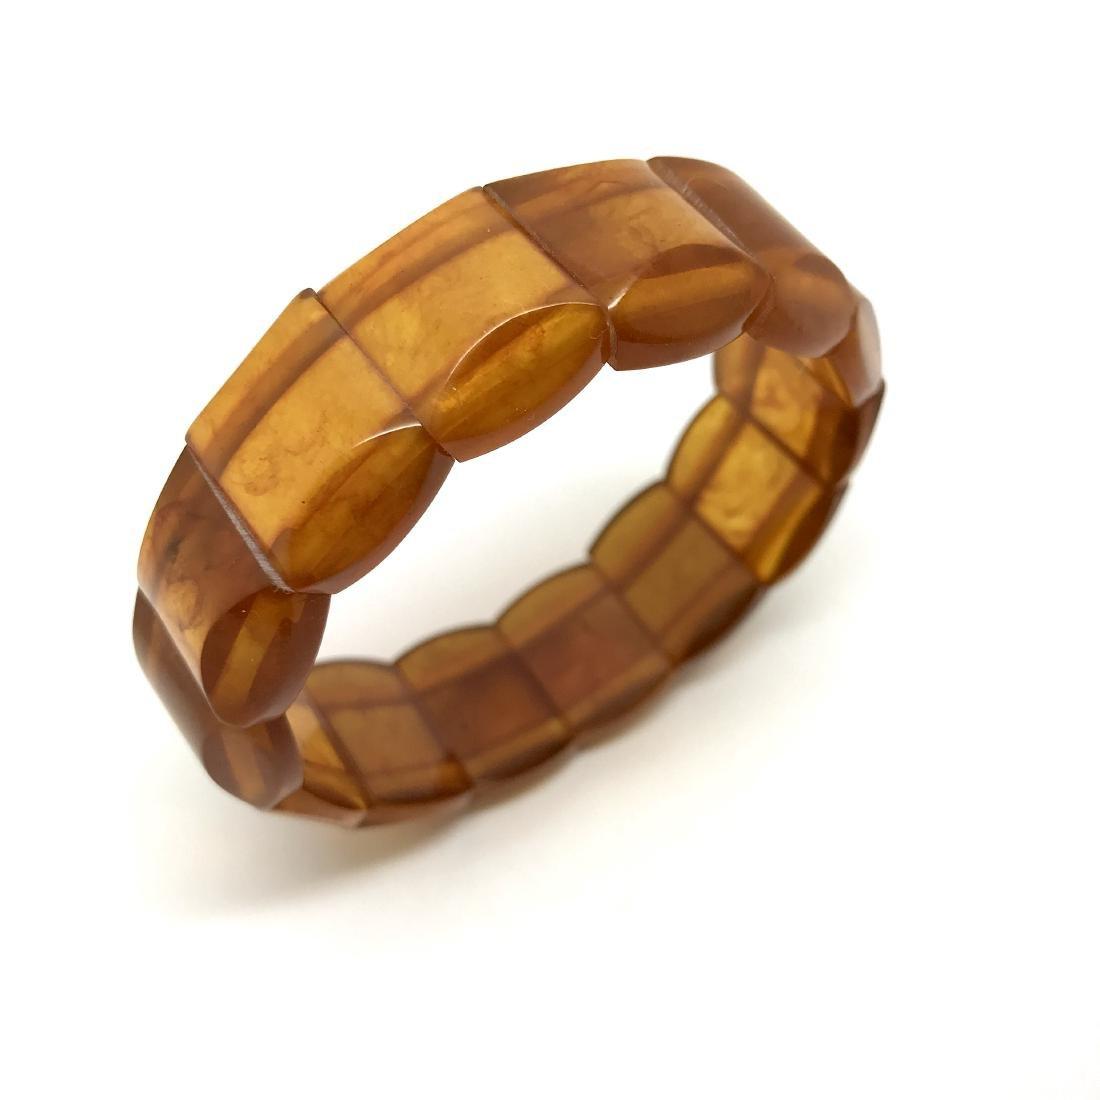 Antique Baltic amber carved slices cuff bracelet 22.9